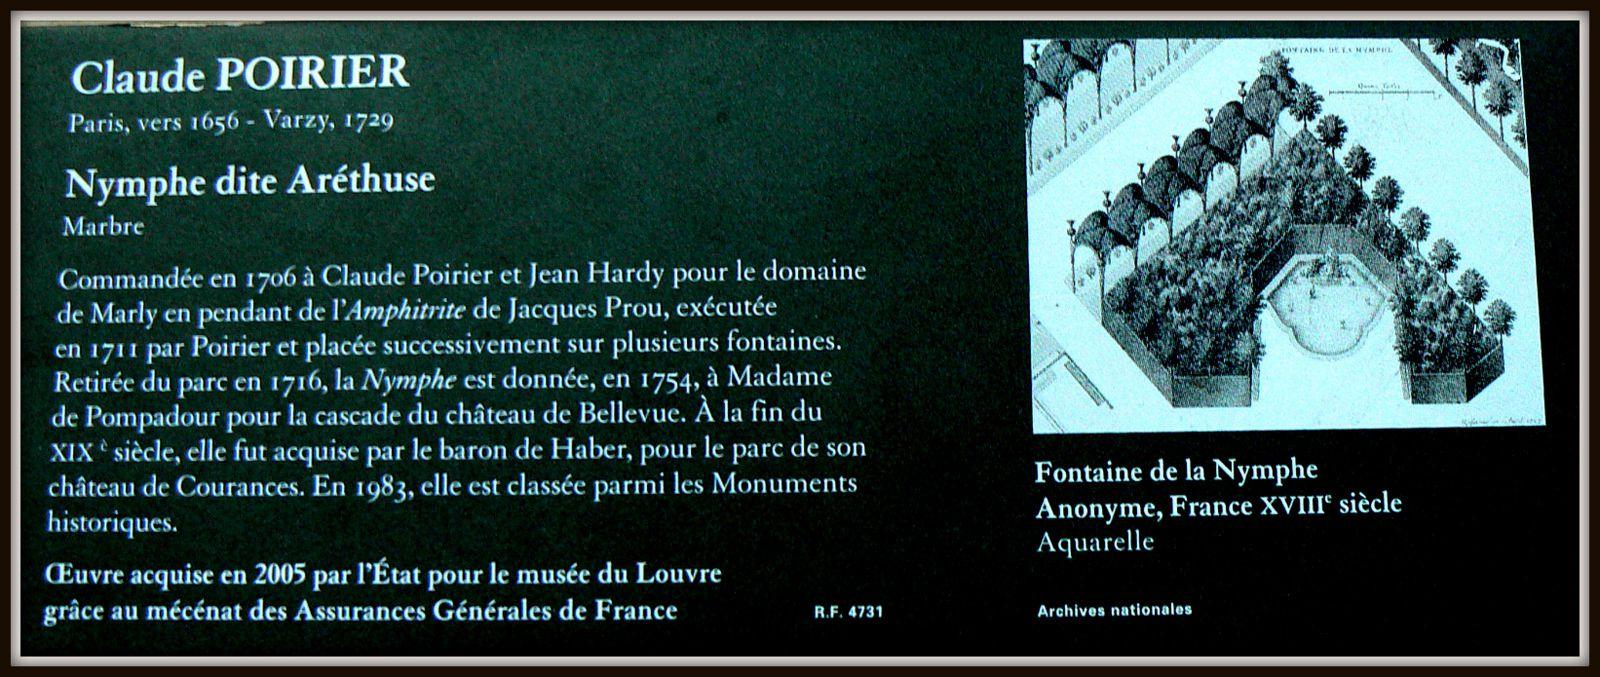 Claude Poirier, Aréthuse